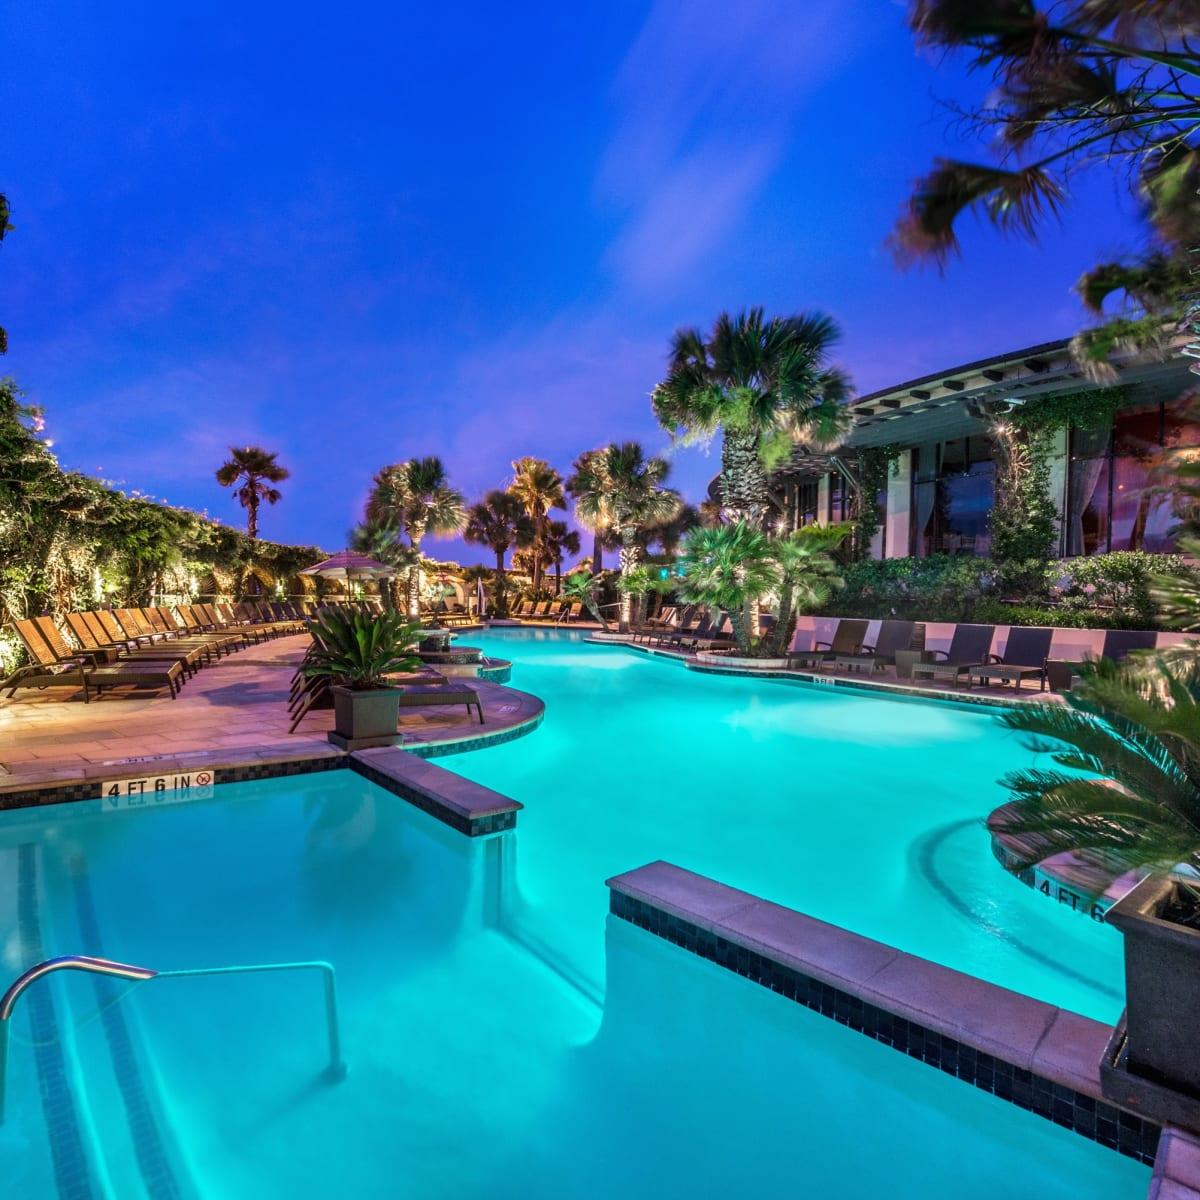 Hotel Galvez pool and swim-up bar